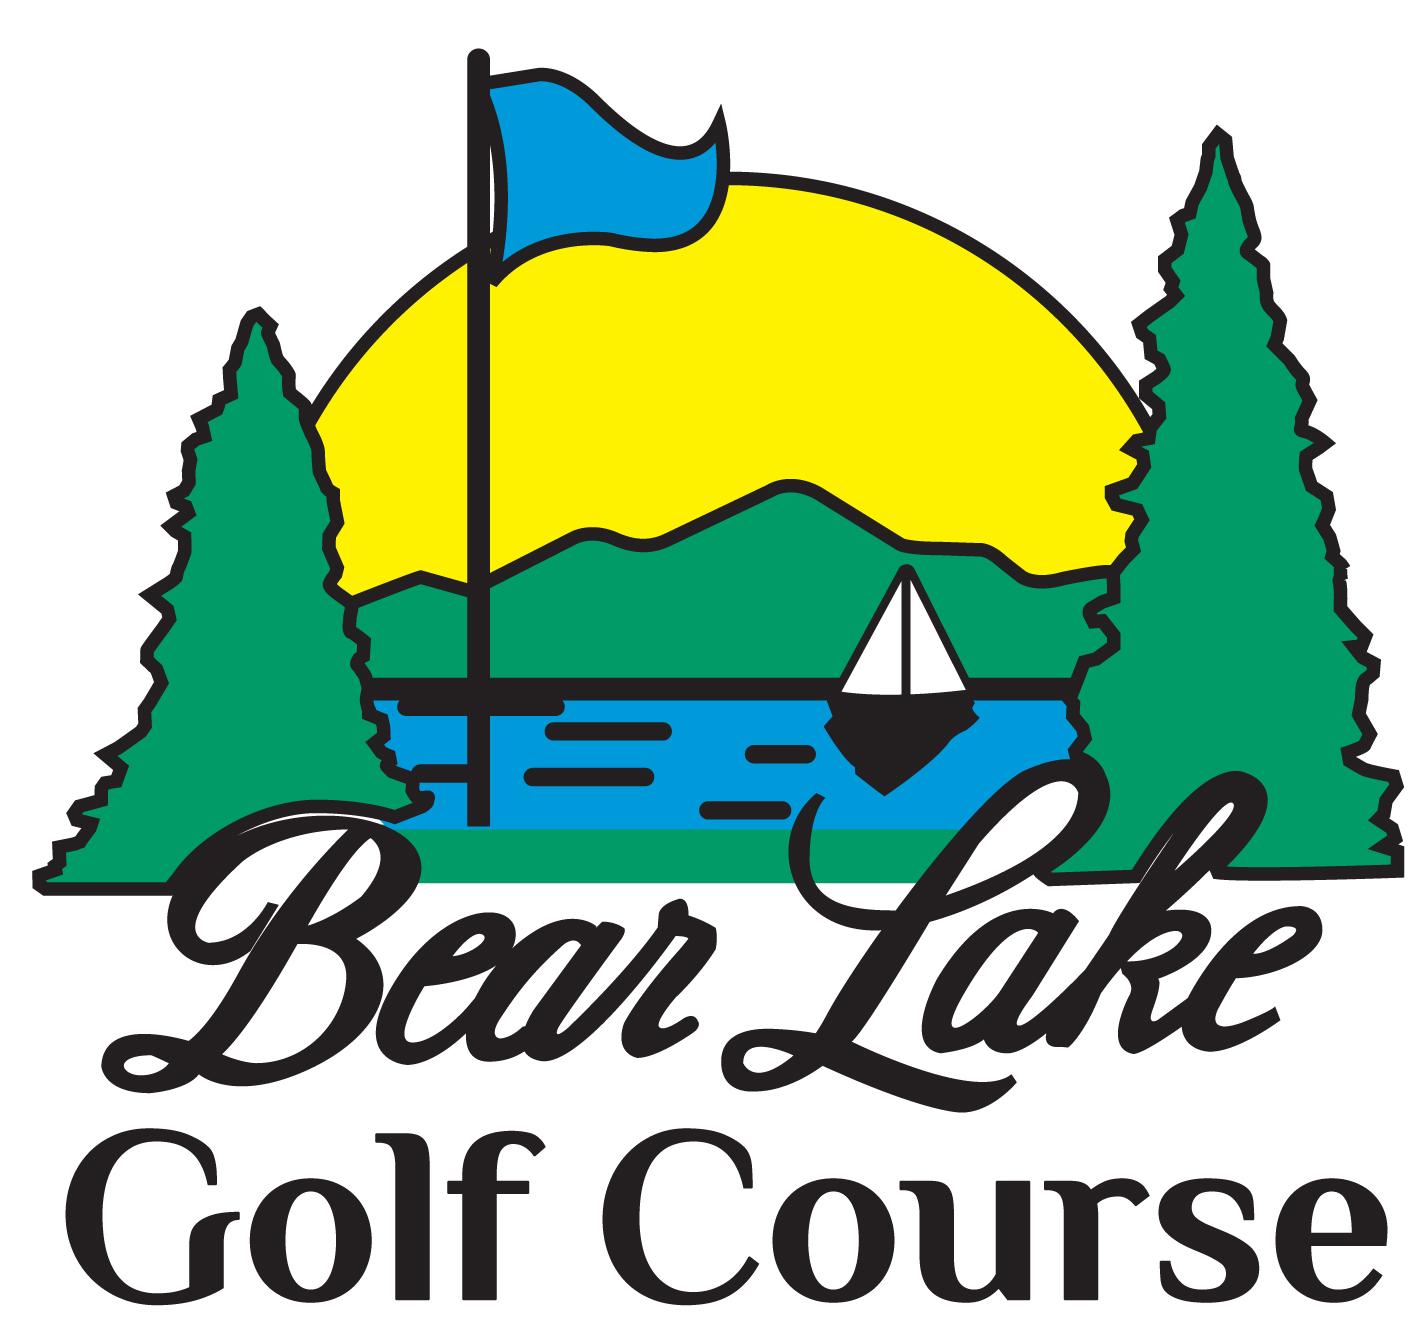 BearLake.com